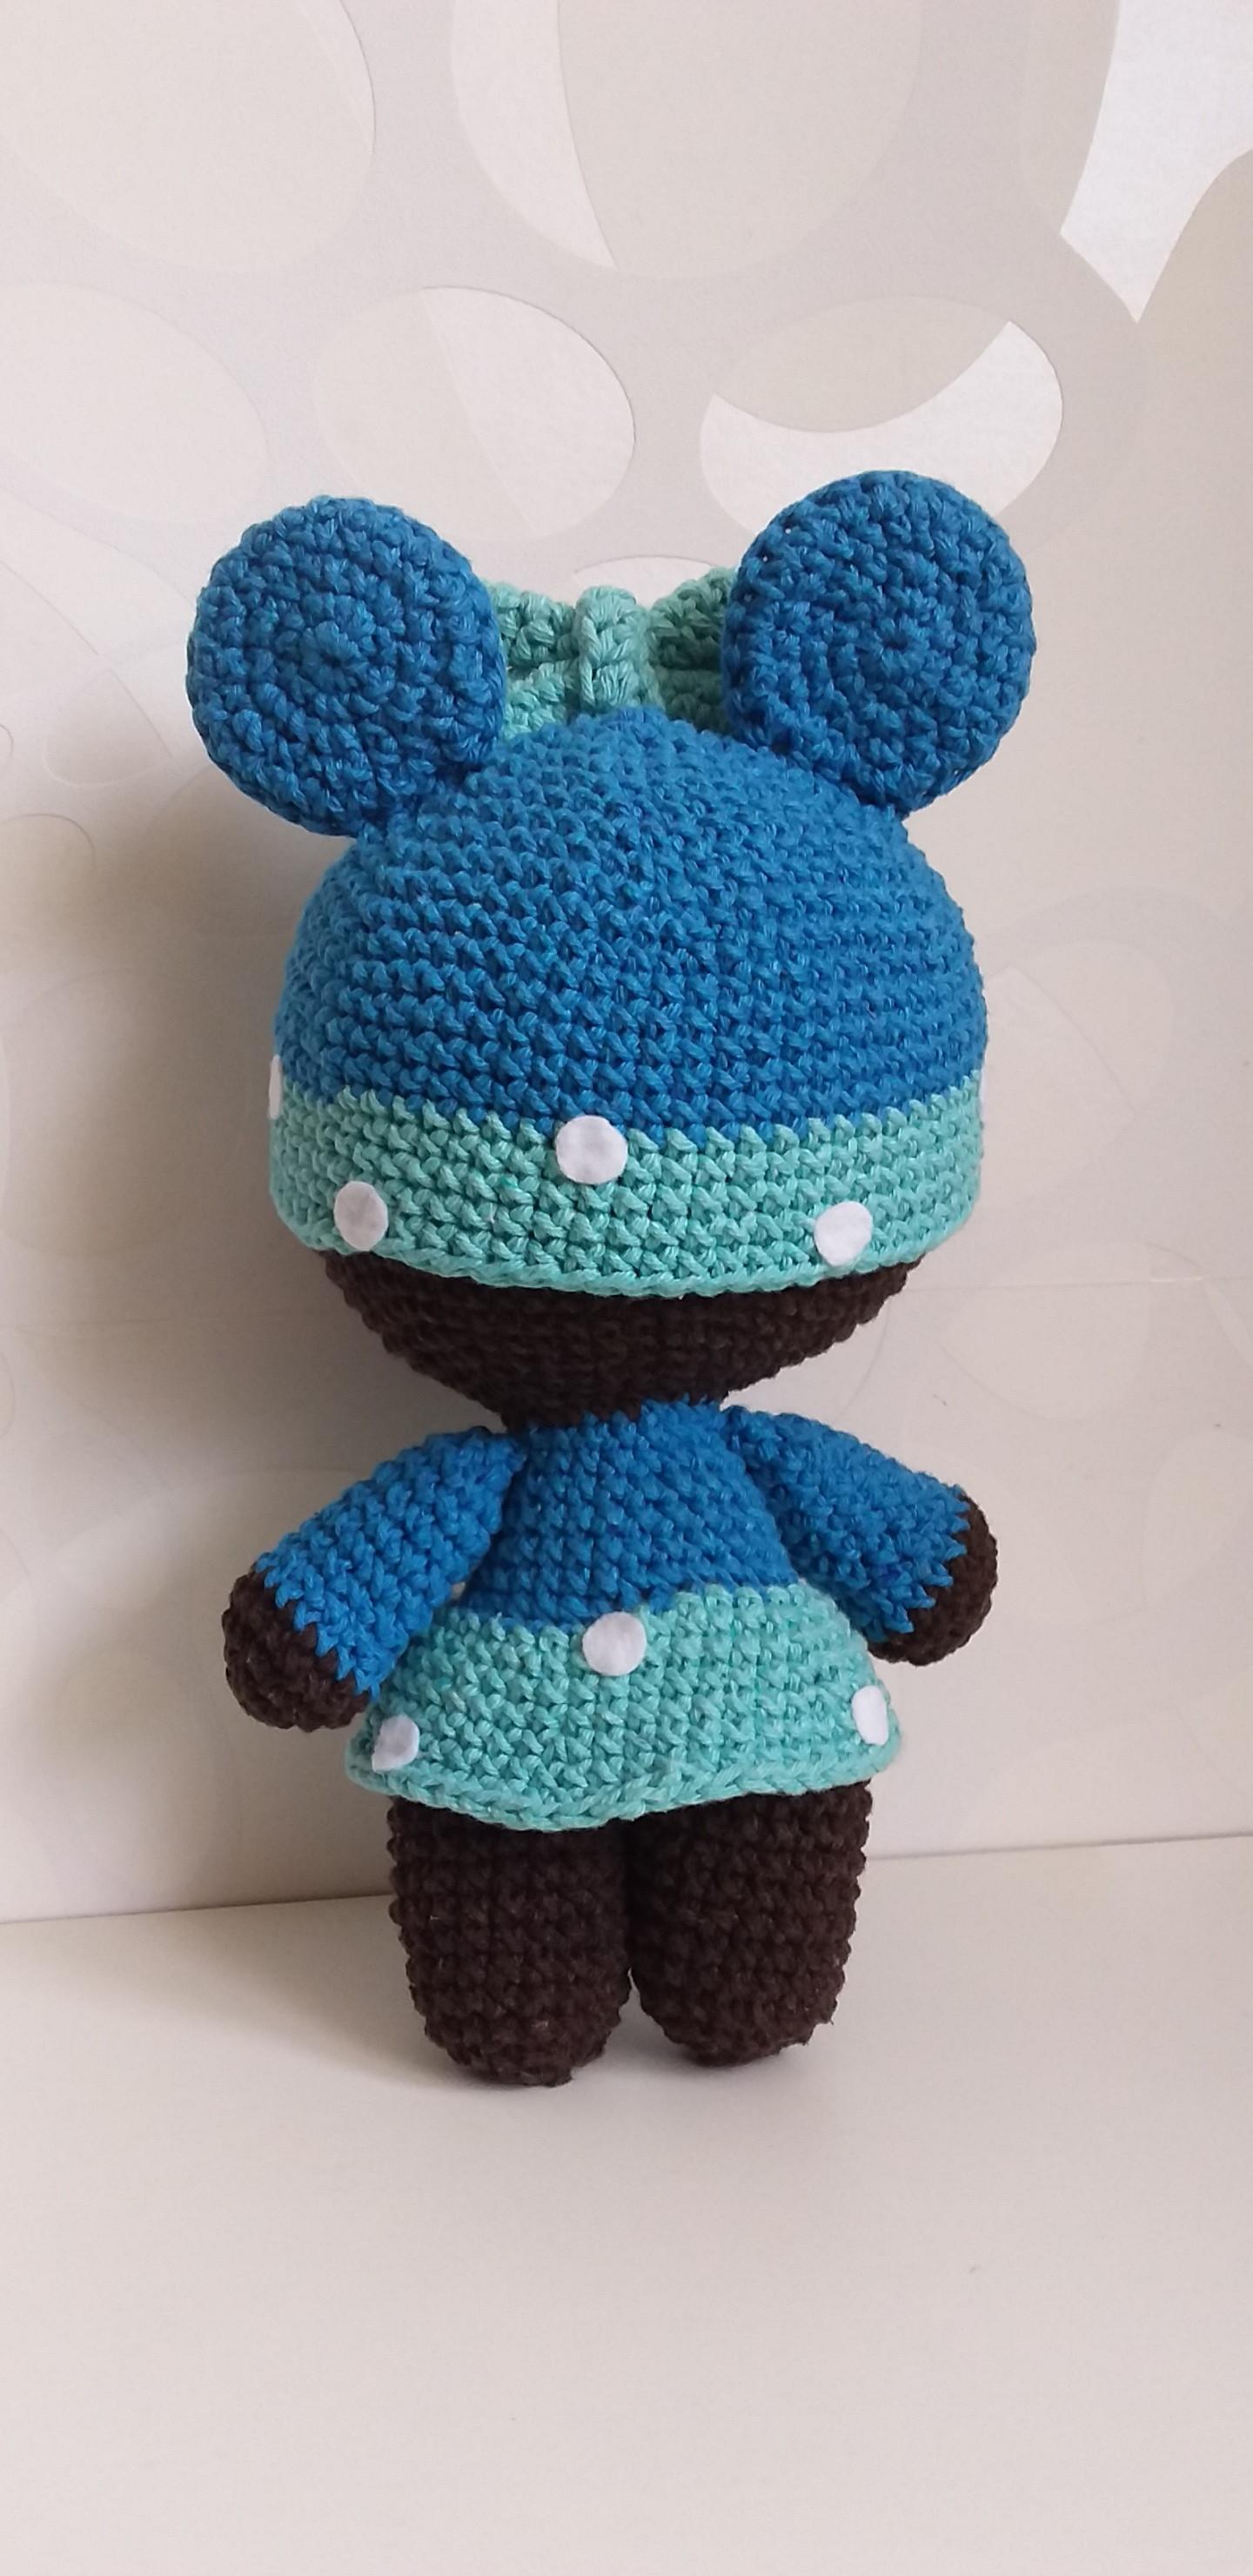 Boneca bebê yoyo Minnie no Elo7   Little Things Amigurumis (A8B84E)   2960x1440